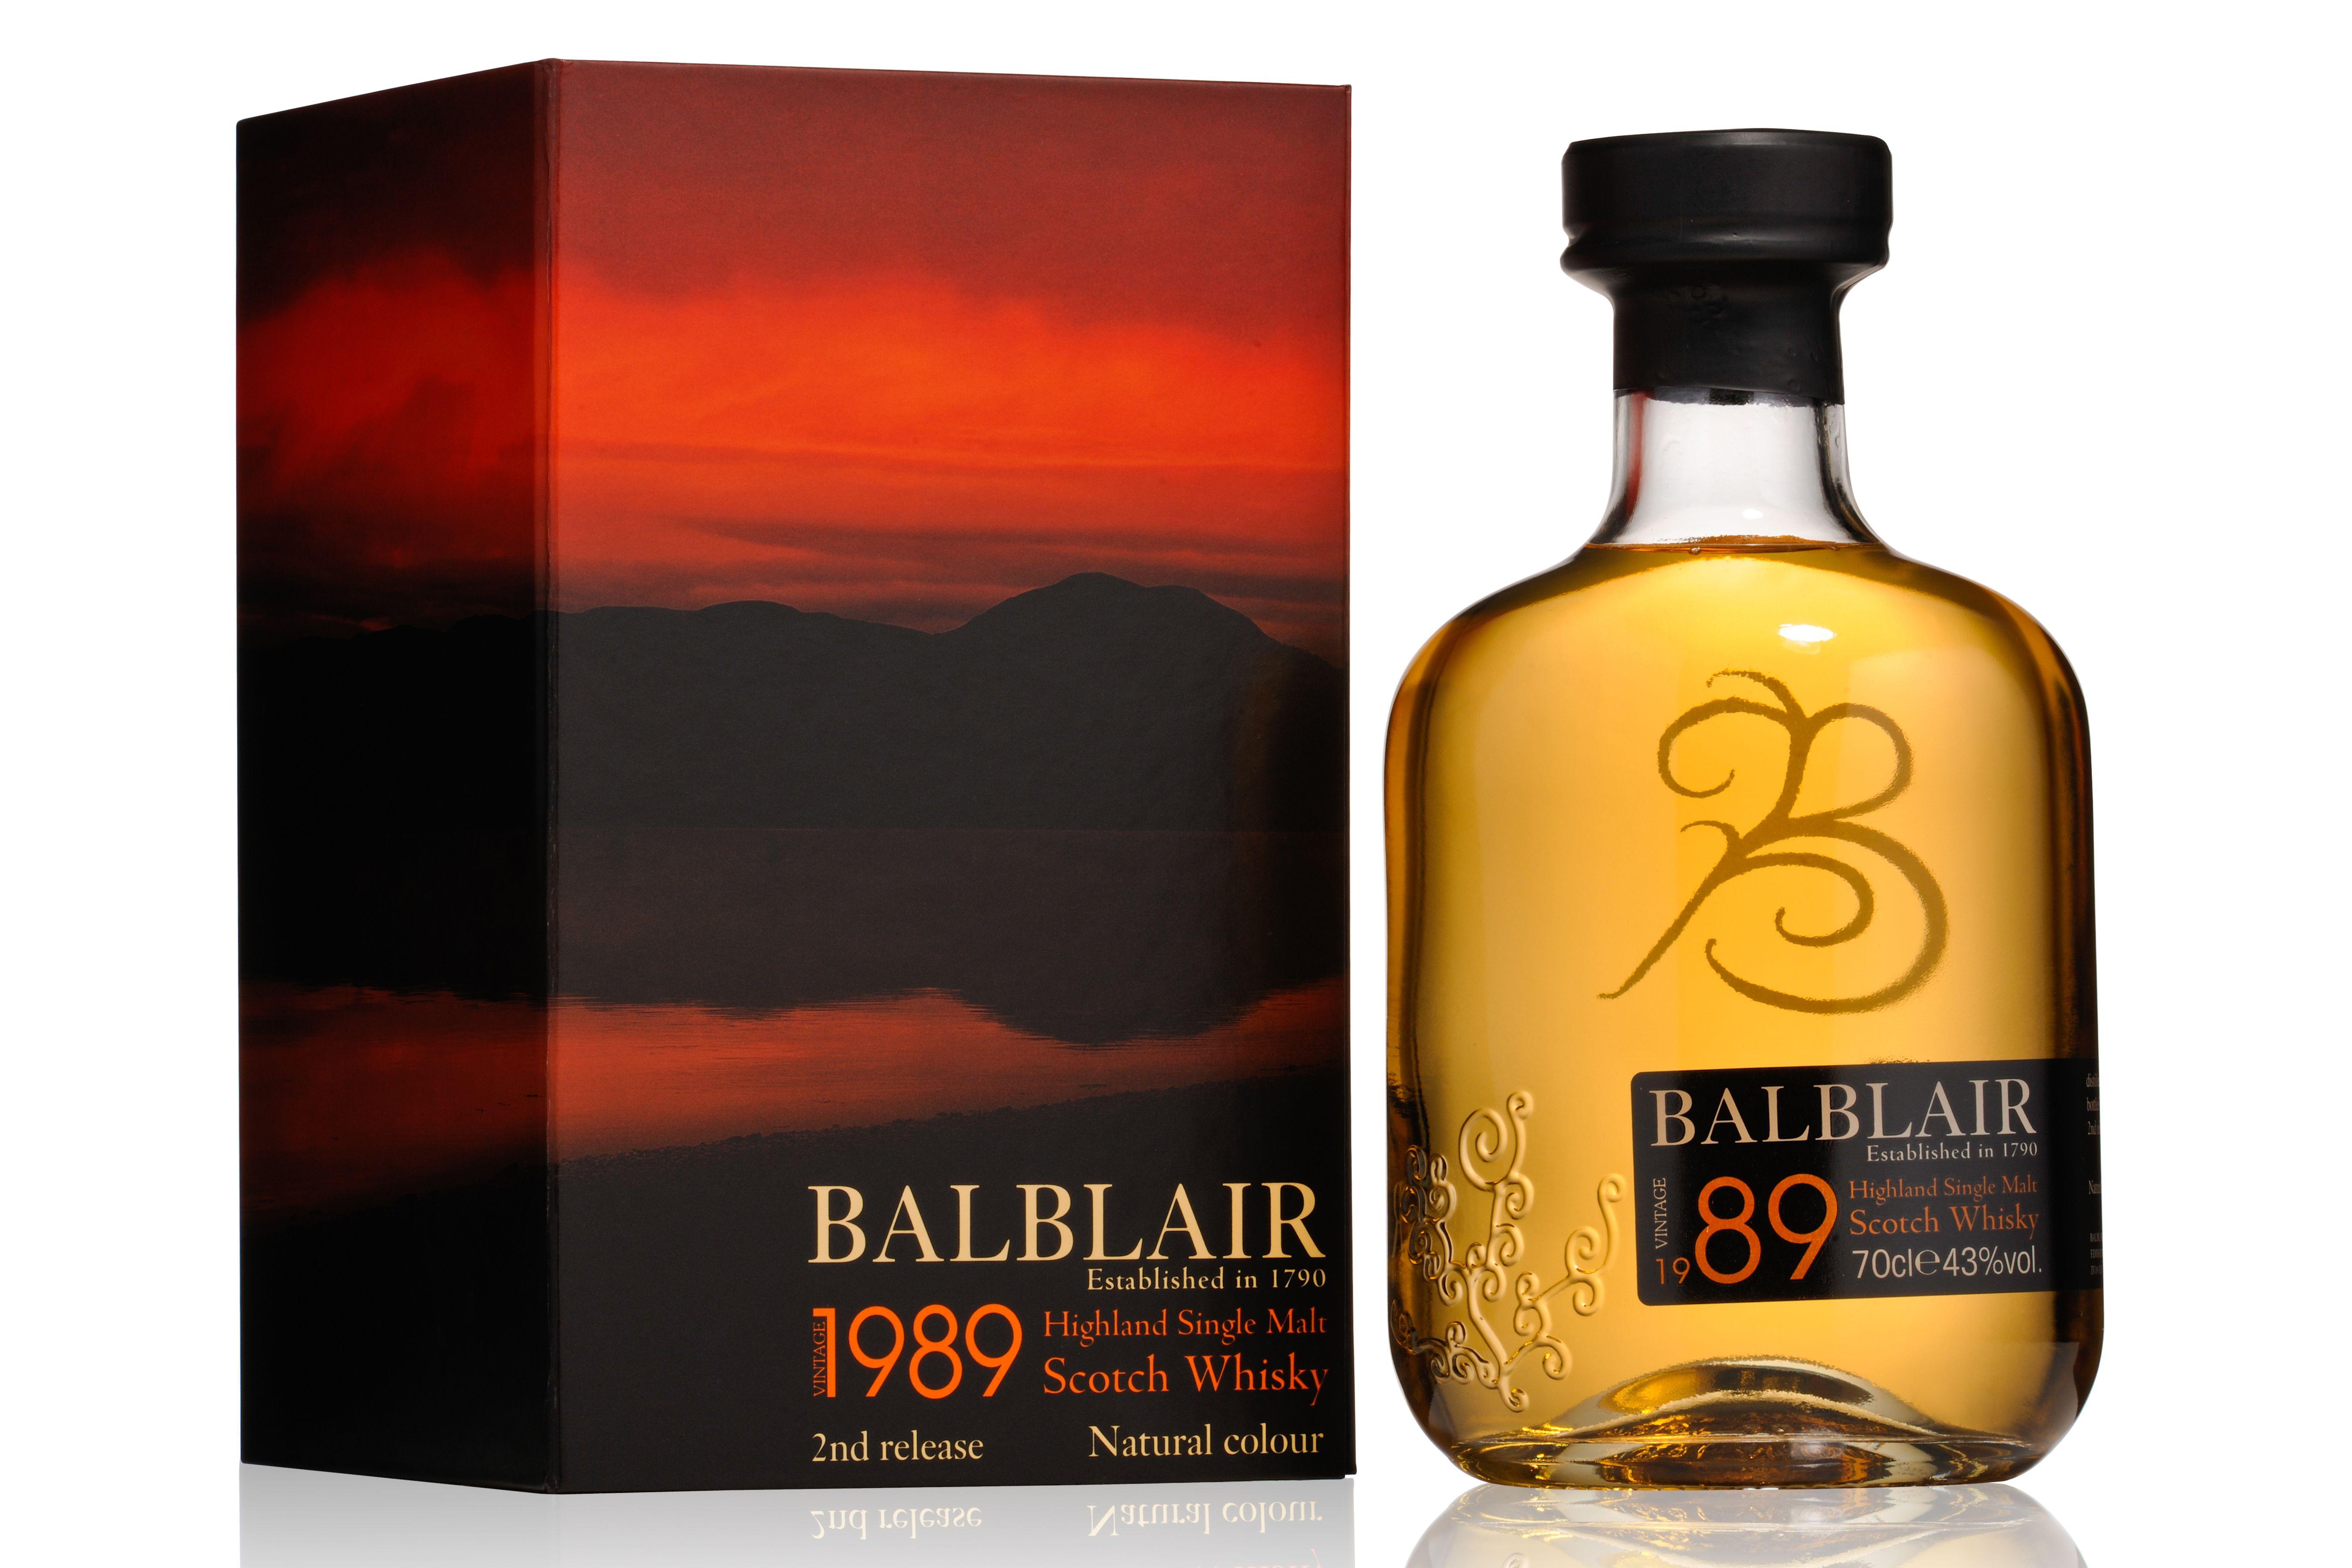 Balblair A Distinguished Grand Marnier For The Most Discriminating Connoisseurs Read More Http Www Upscalelivingmag Com Balblair Viski